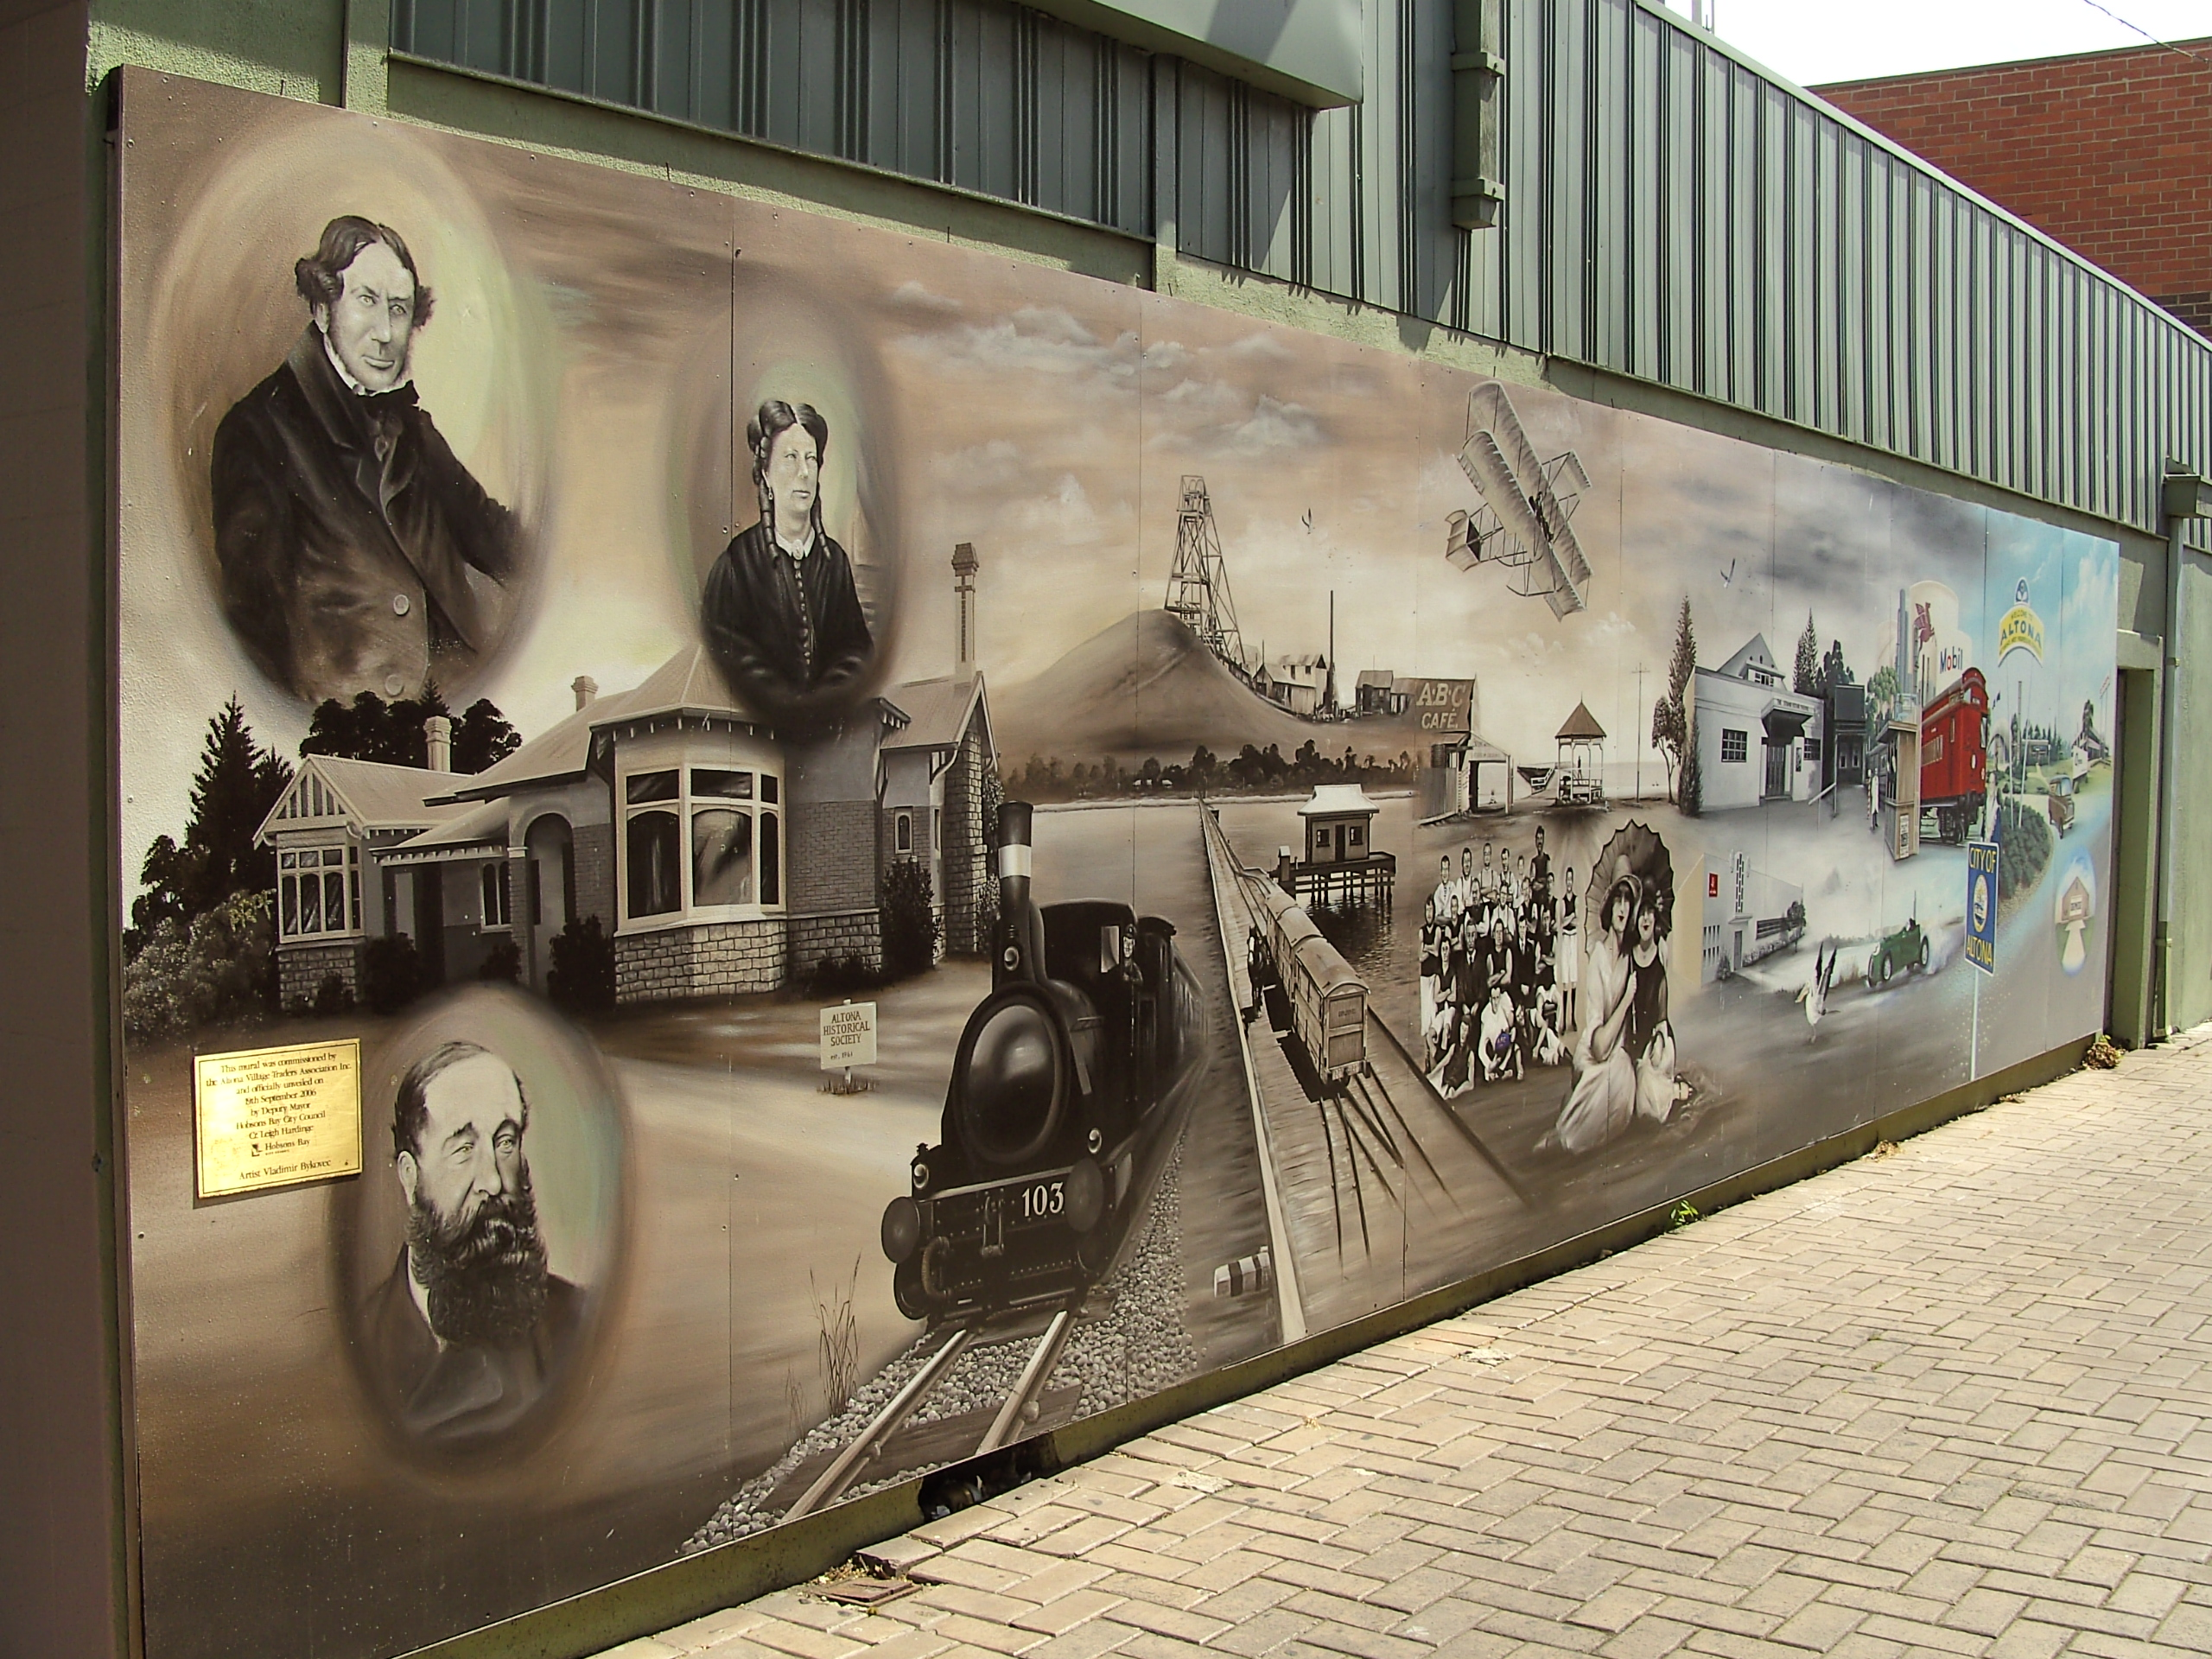 Altona_VIC_mural-historical ...altona village